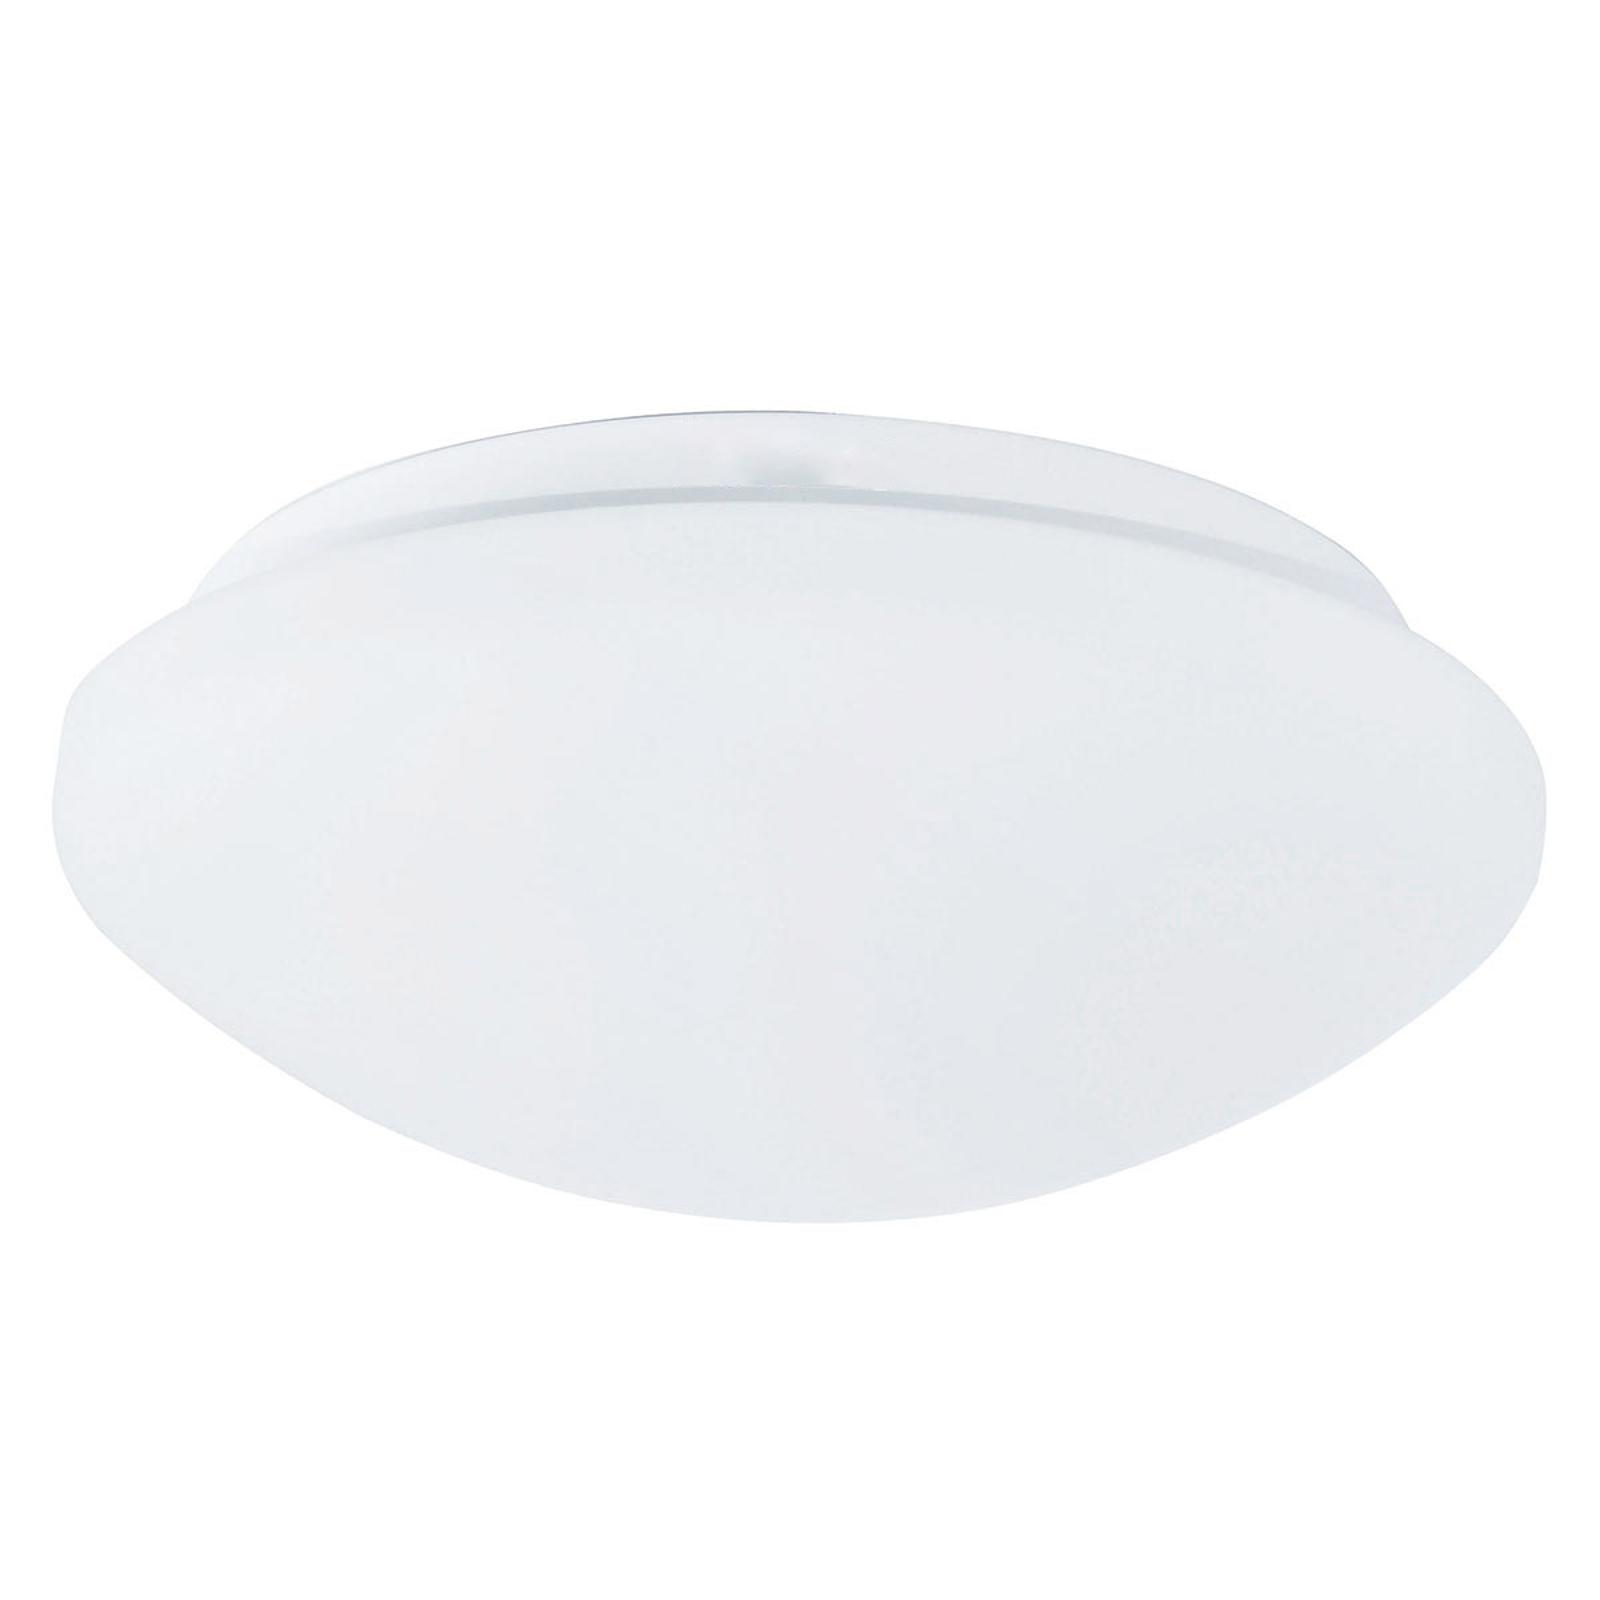 Sensor plafondlamp LED DLMW1828cw